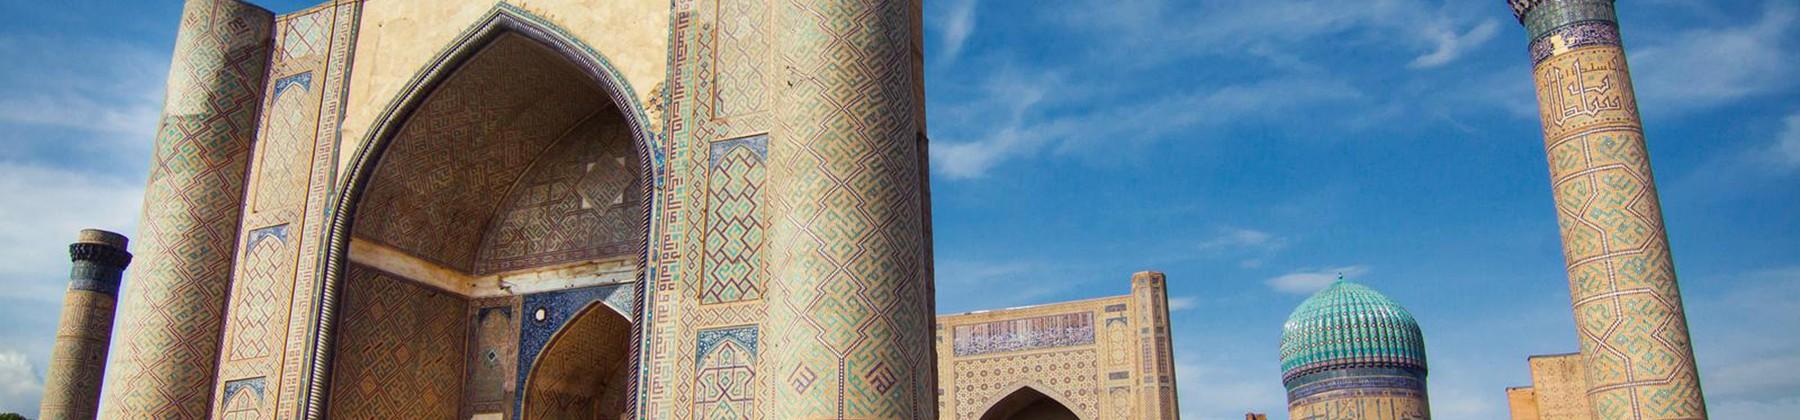 Прекрасный Узбекистан: Ташкент, Самарканд, Бухара и Хива - 1